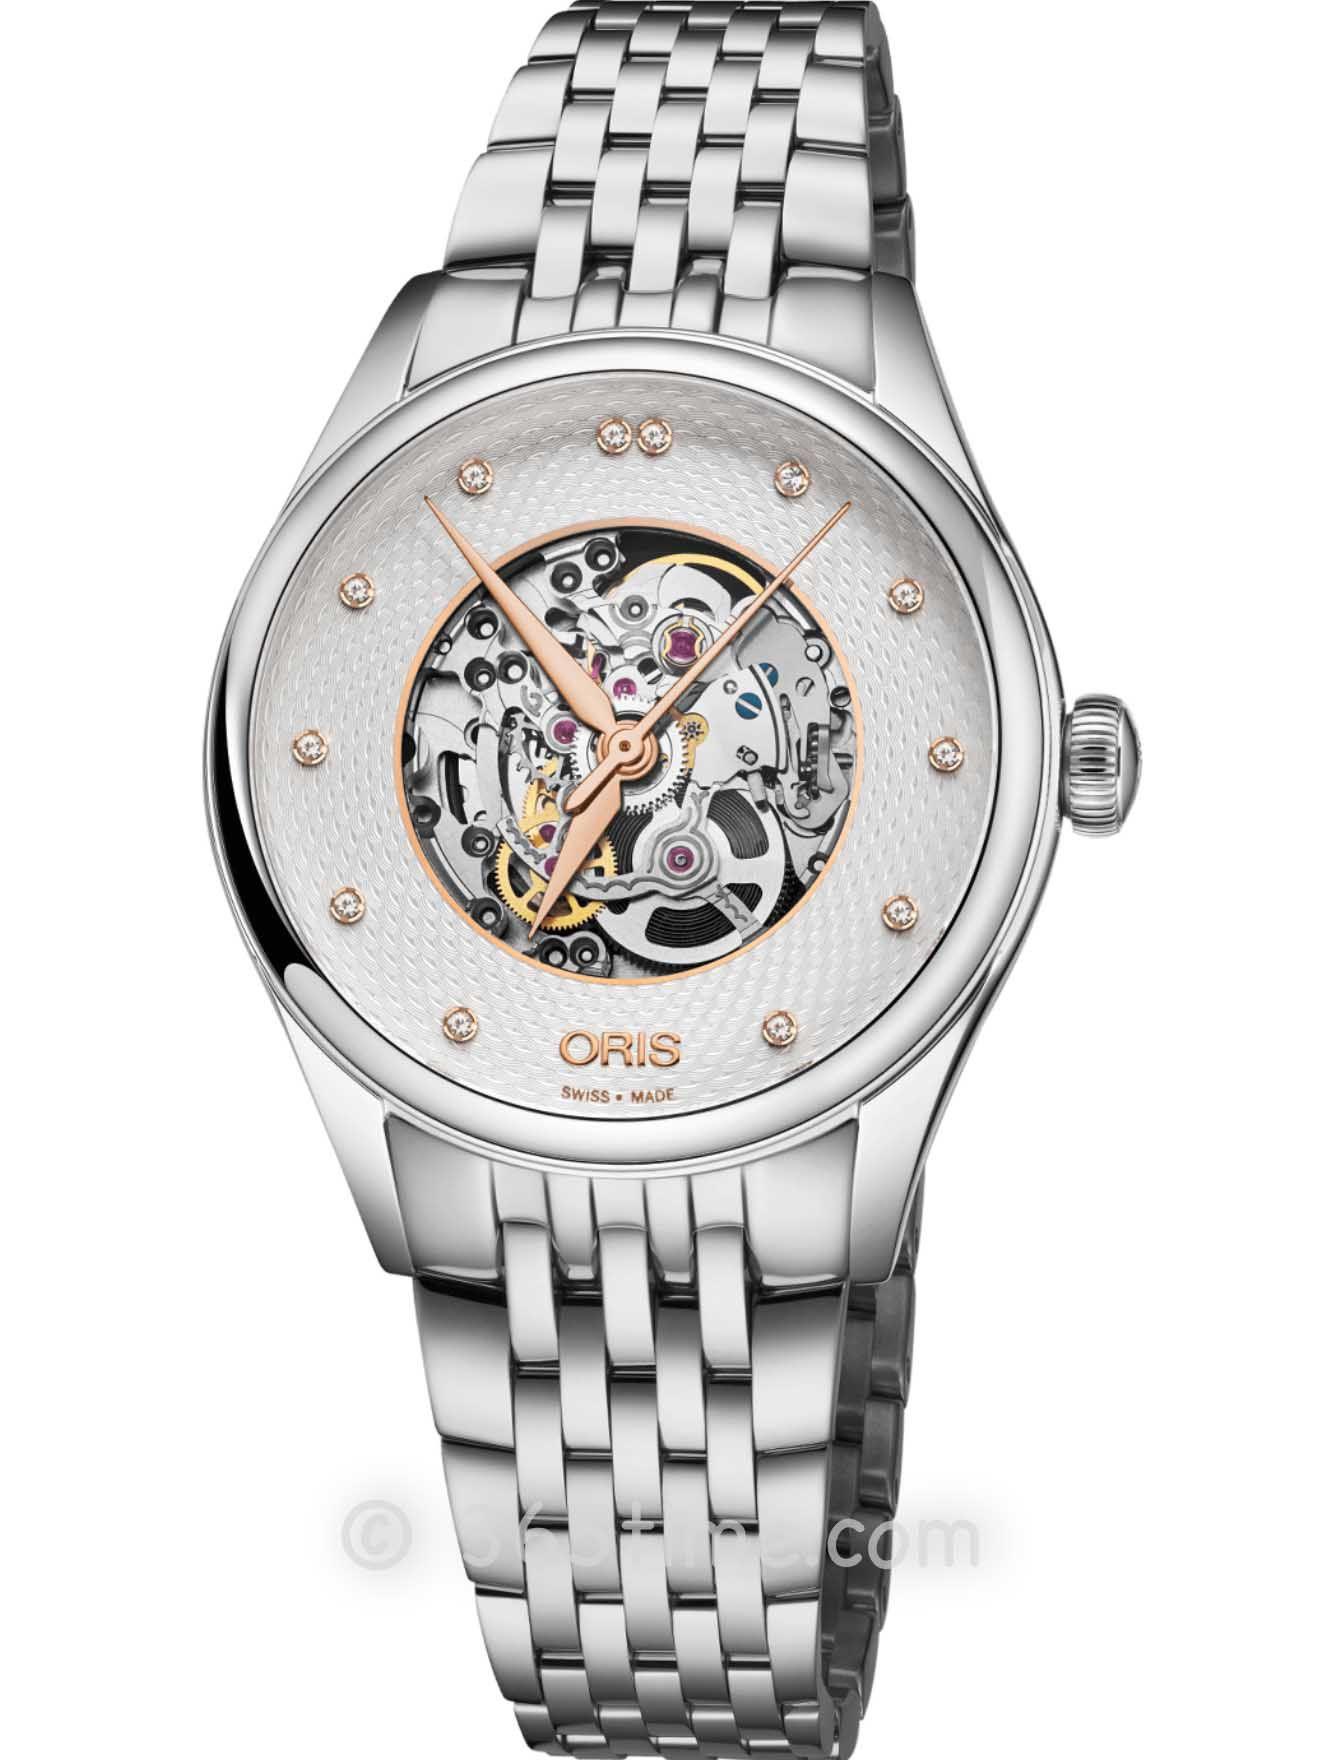 Oris豪利时文化系列镂空钻石腕表01 560 7724 4031-07 8 17 79